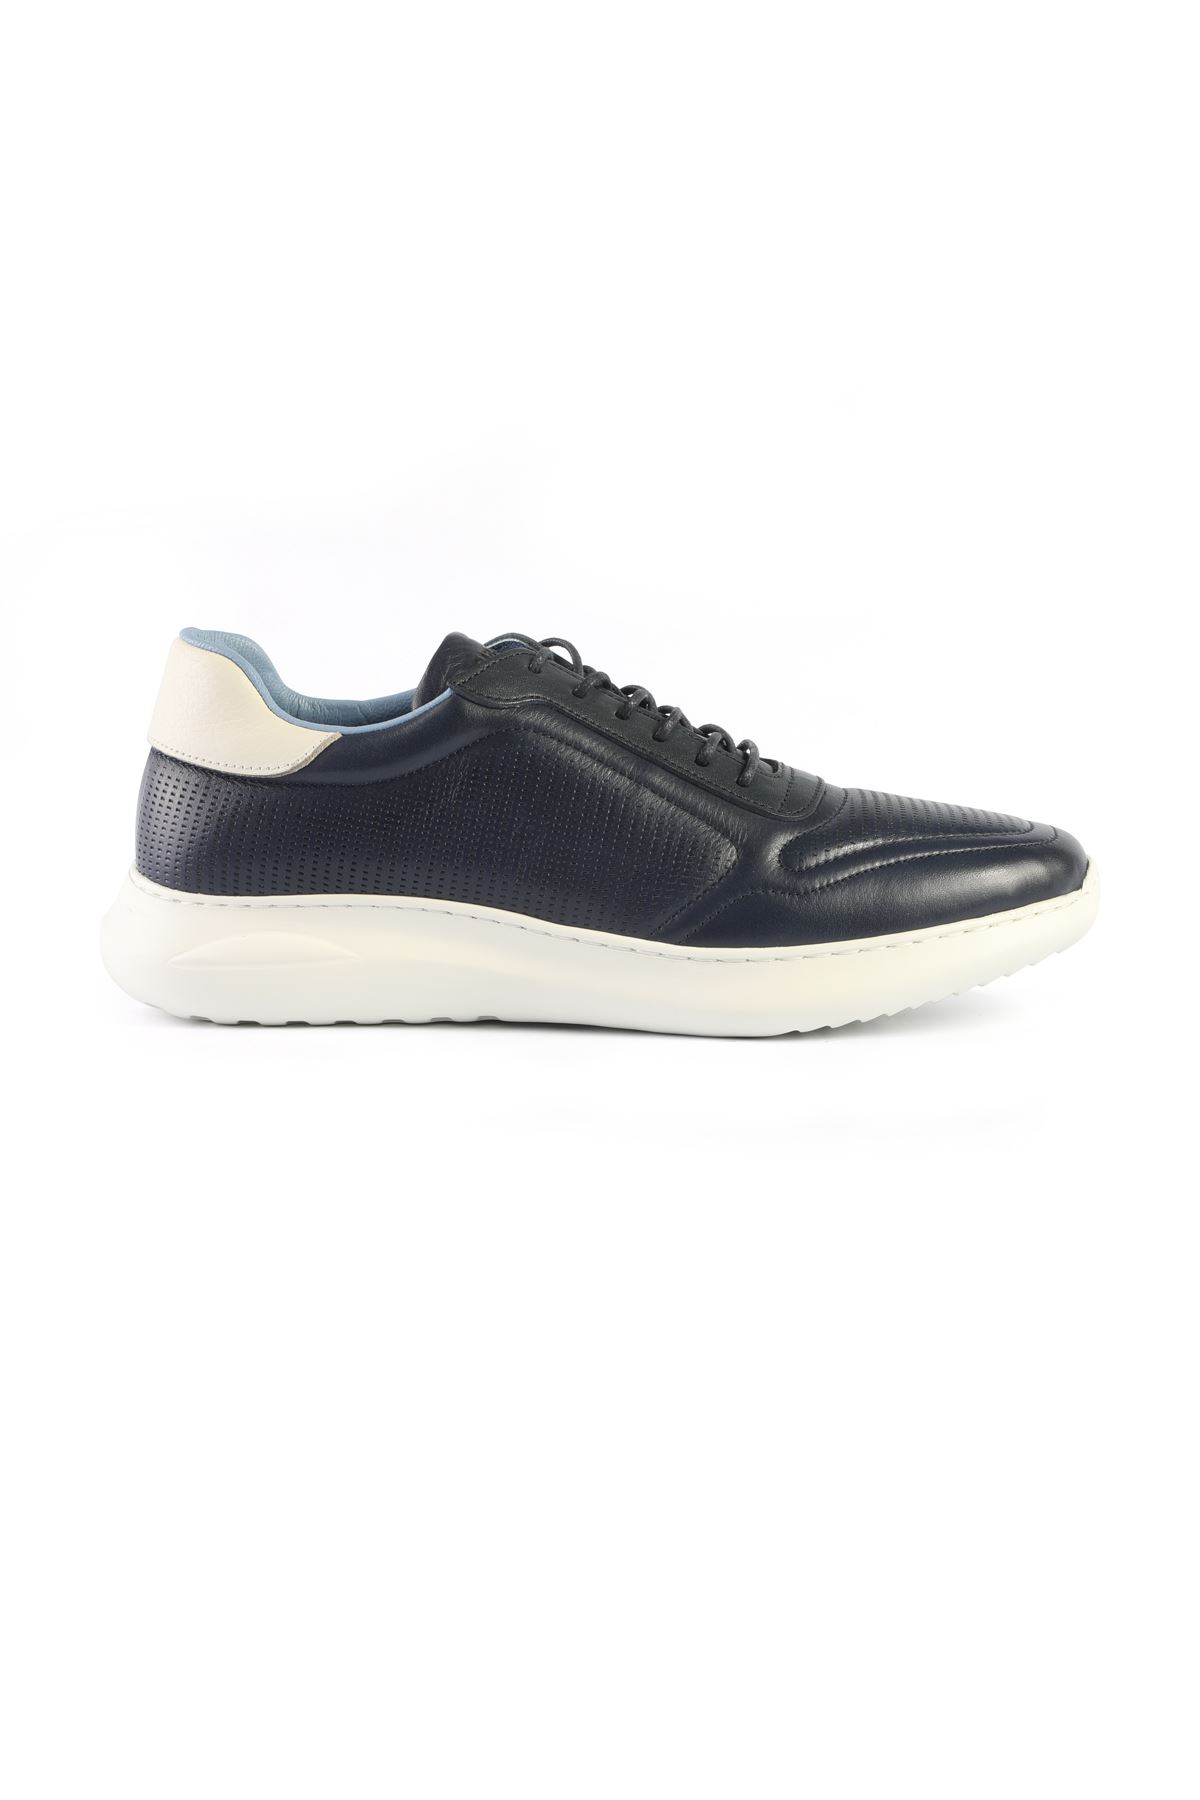 Libero L3401 Navy Blue Sport Shoes